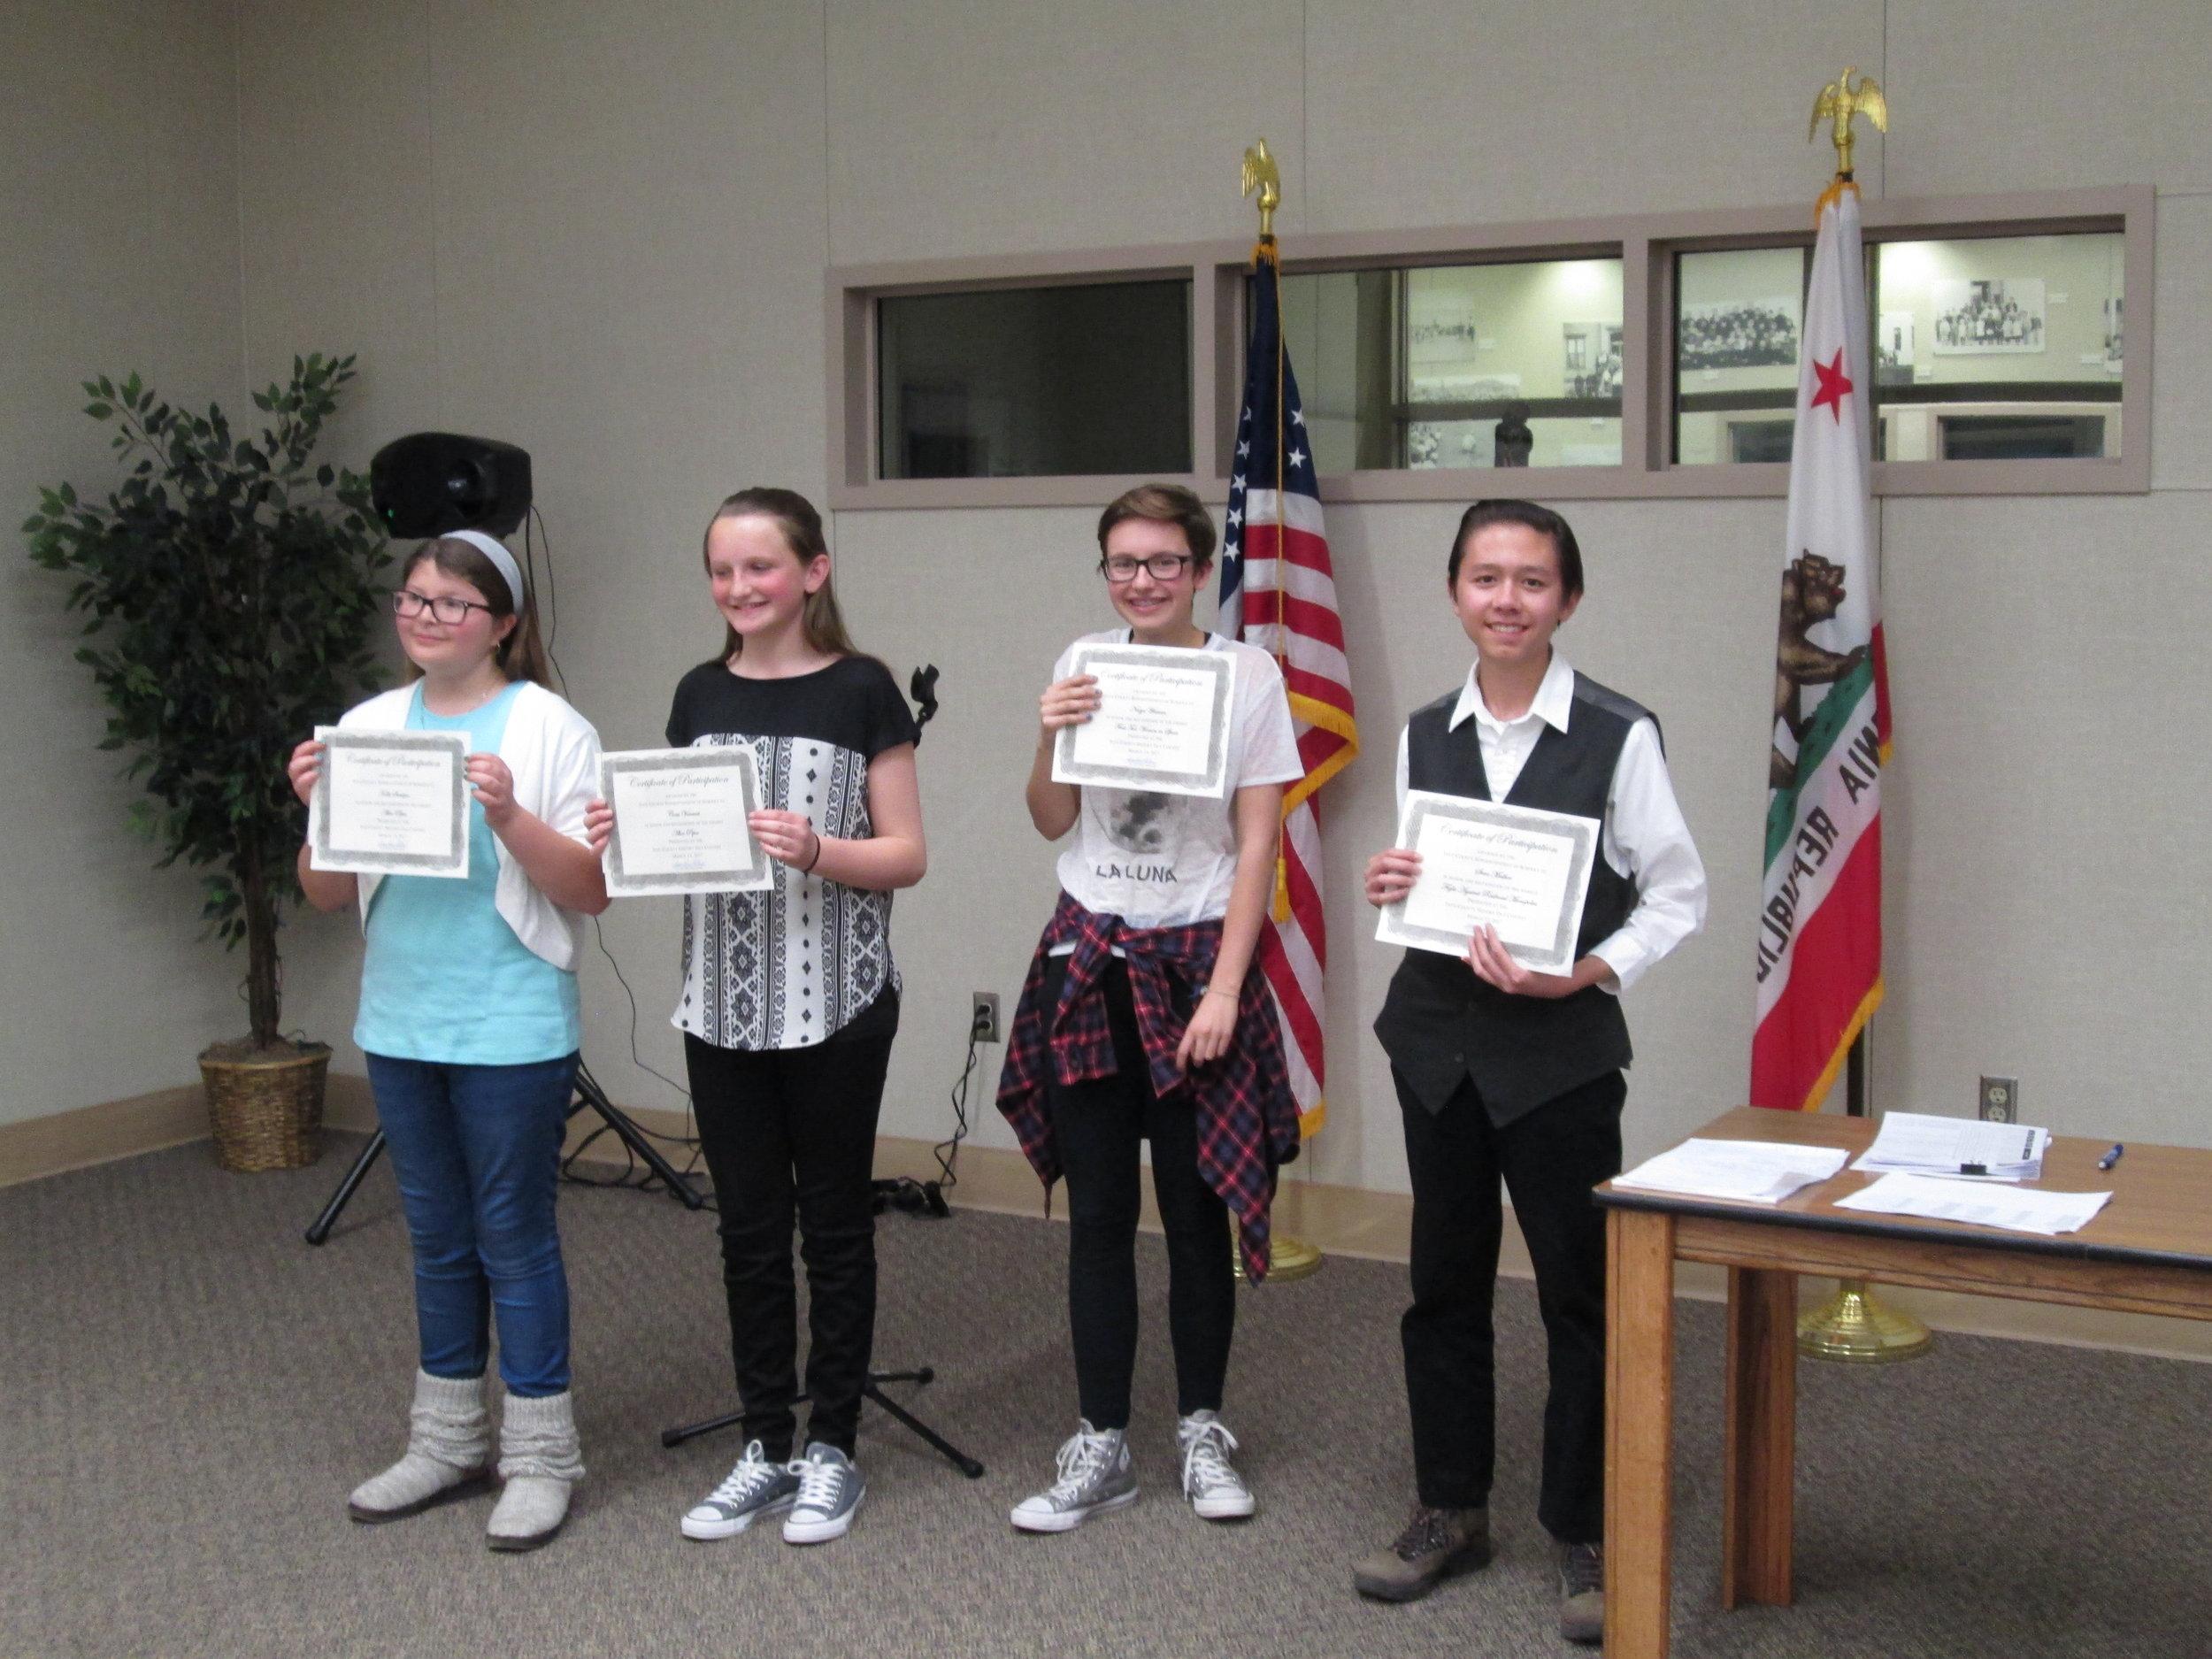 Caption: Winners Kaki Saulque, Cora VanNest, Naiya Warren, and Steven Mather